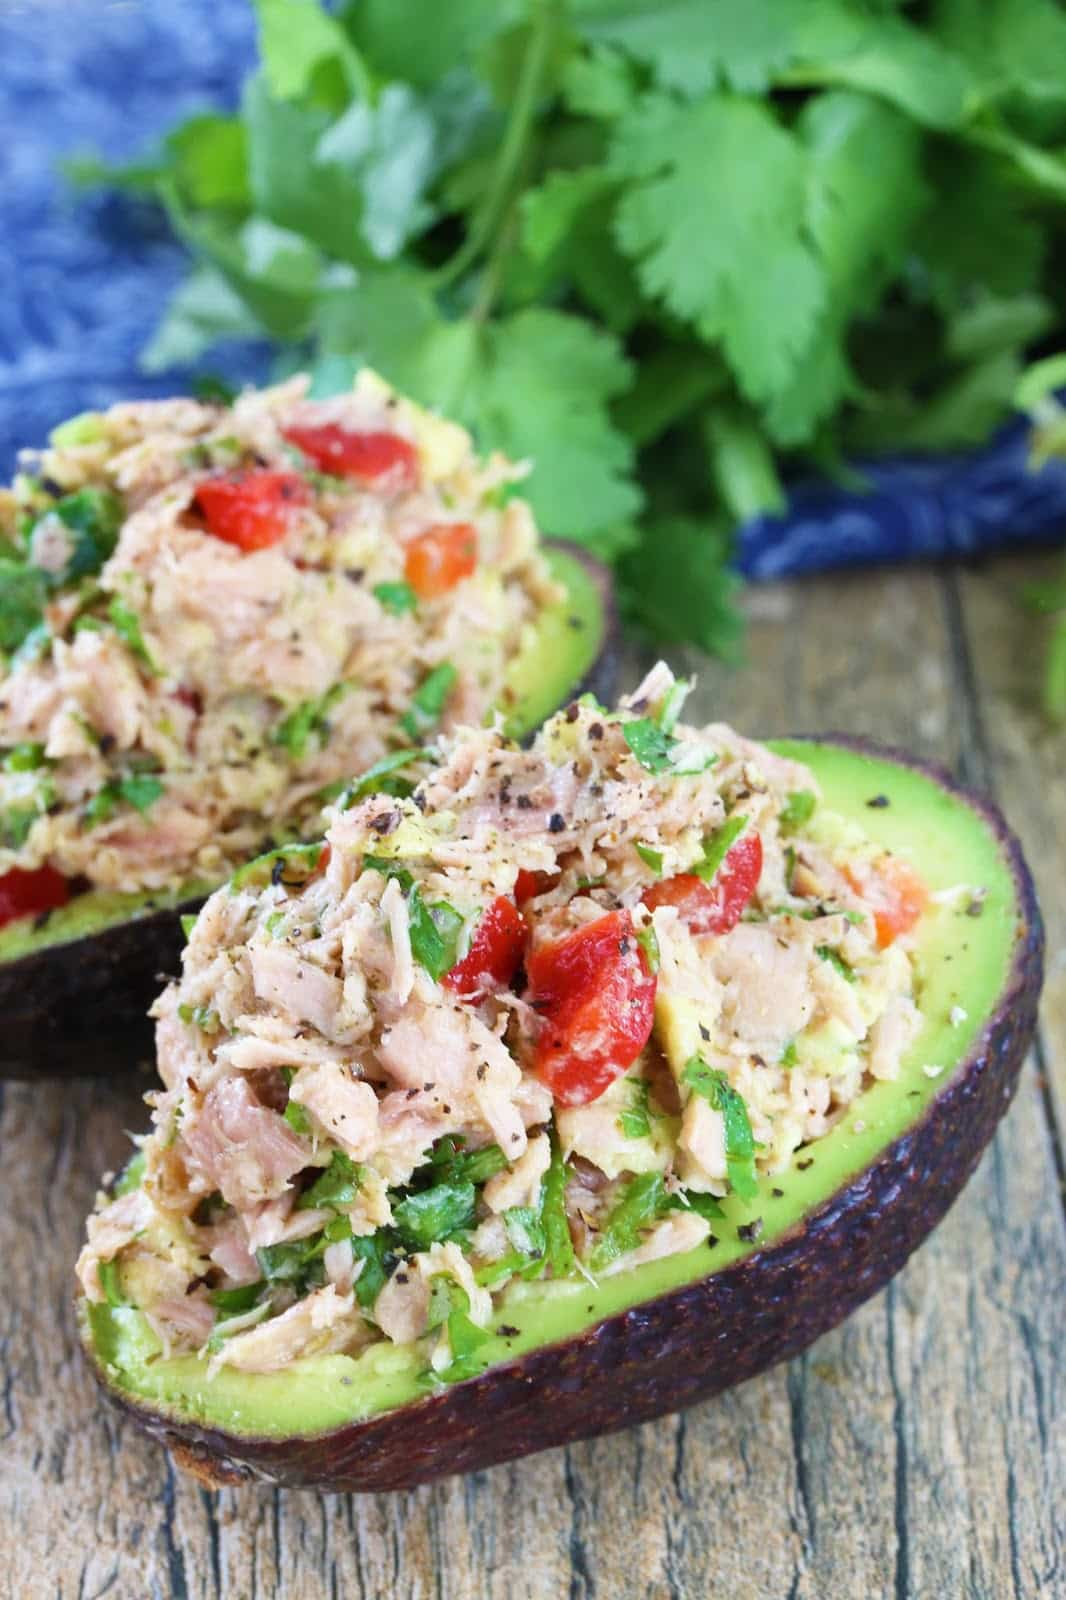 Healthy Dinner Ideas  Healthy Thai Tuna Stuffed Avocado